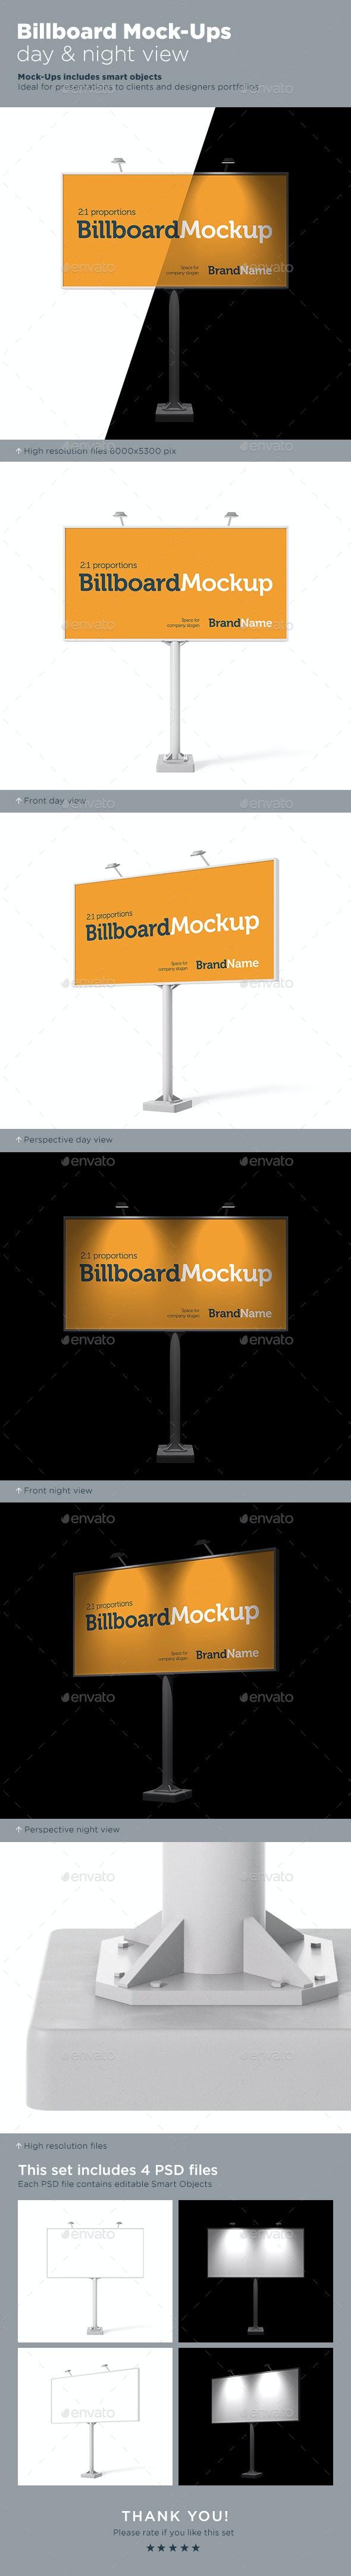 Billboard Mock-Ups. Day & night view - Signage Print